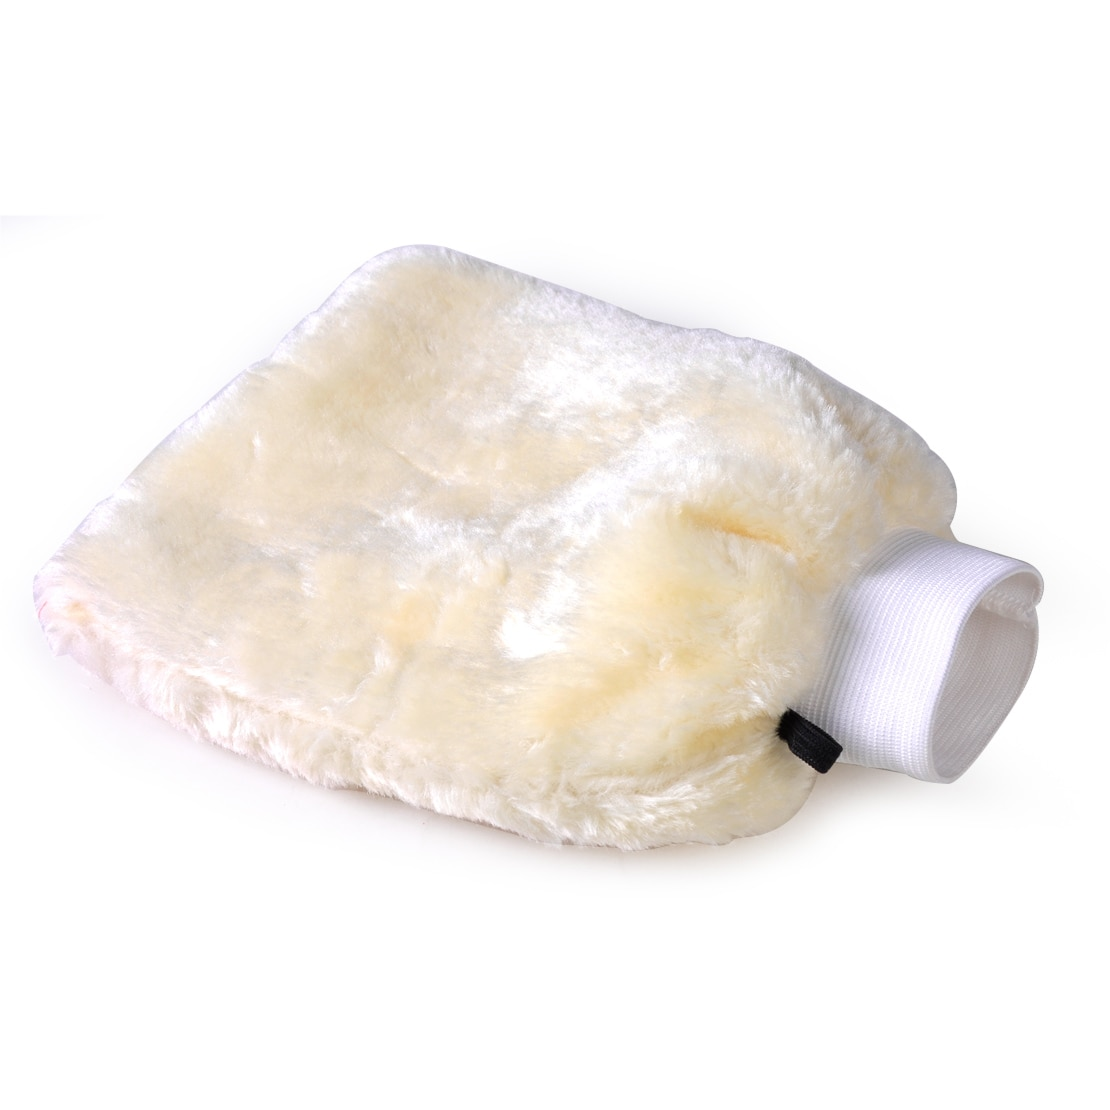 DWCX guante de lavado de doble lana suave para coche, cepillo de limpieza a mano, cepillo de polvo de piel de oveja, arandela de lana de cordero para BMW, Audi, Nissan, VW, Toyota